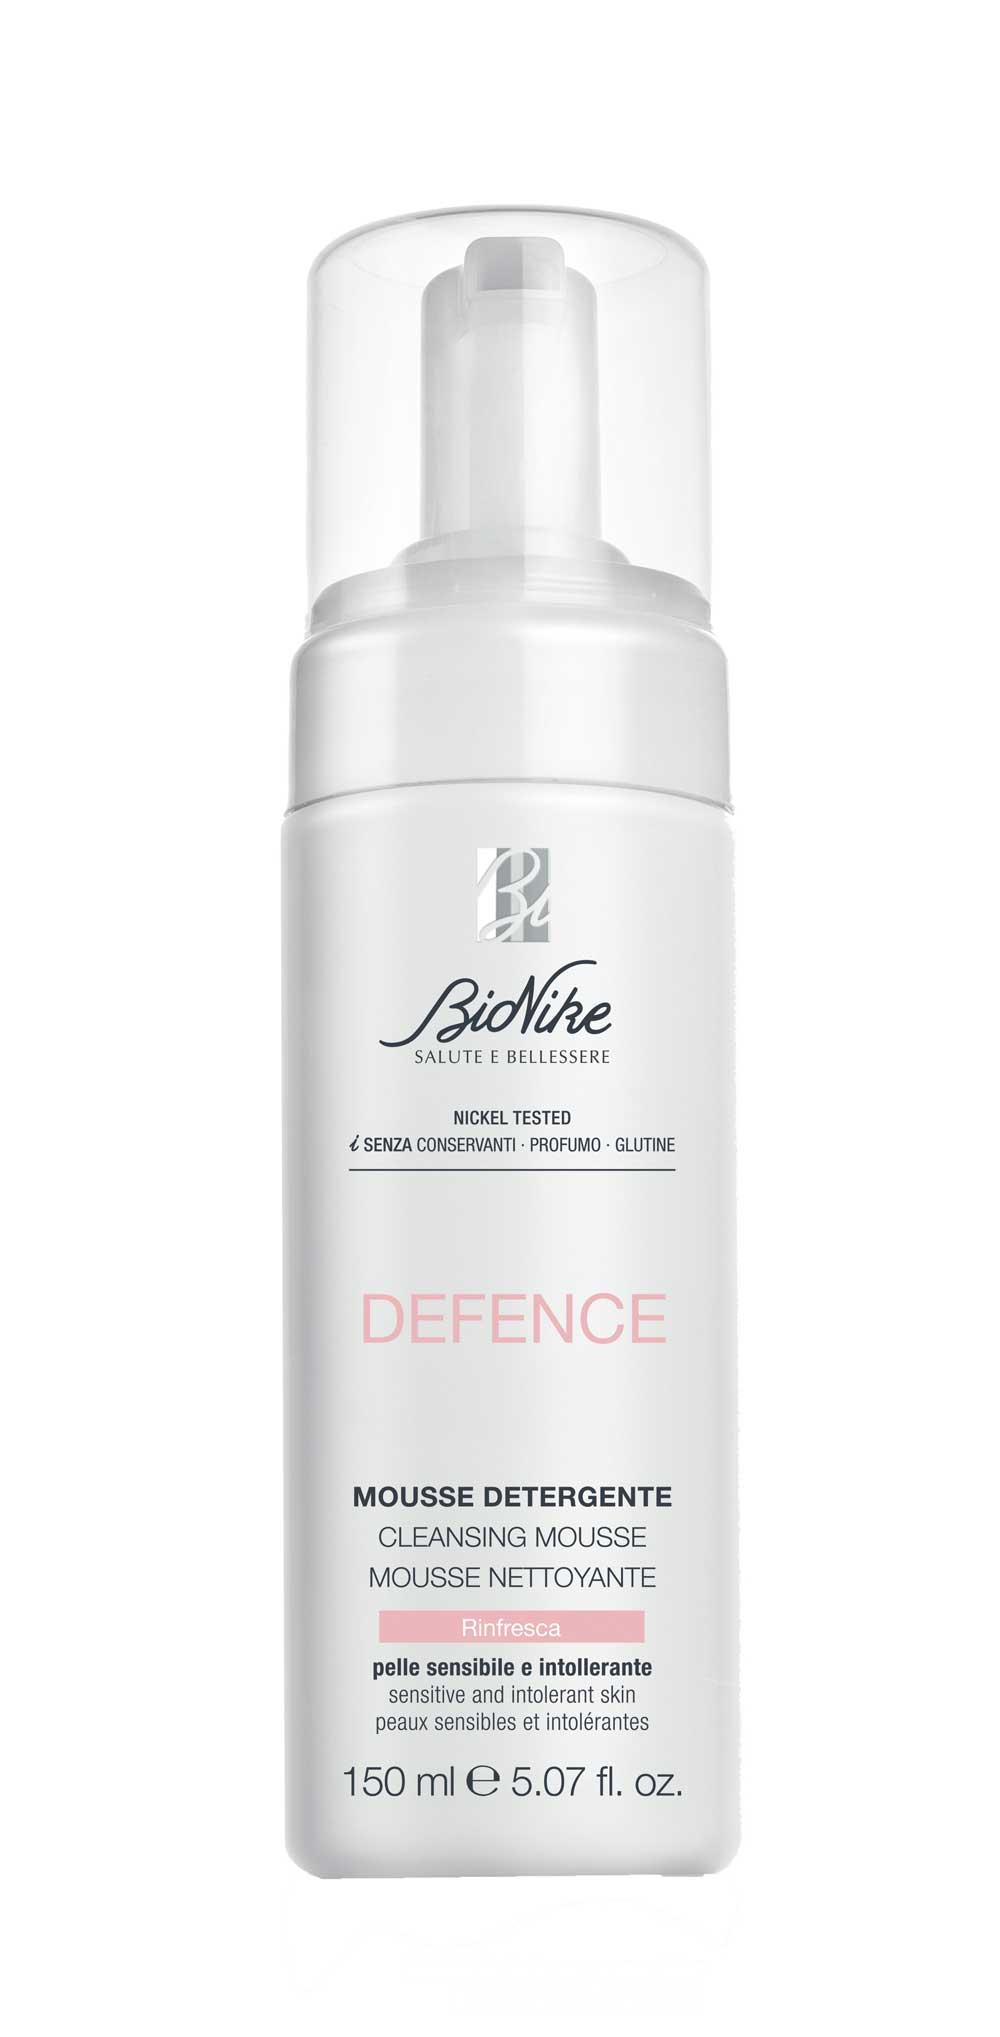 Defence Mousse Detergente BioNike 150ml